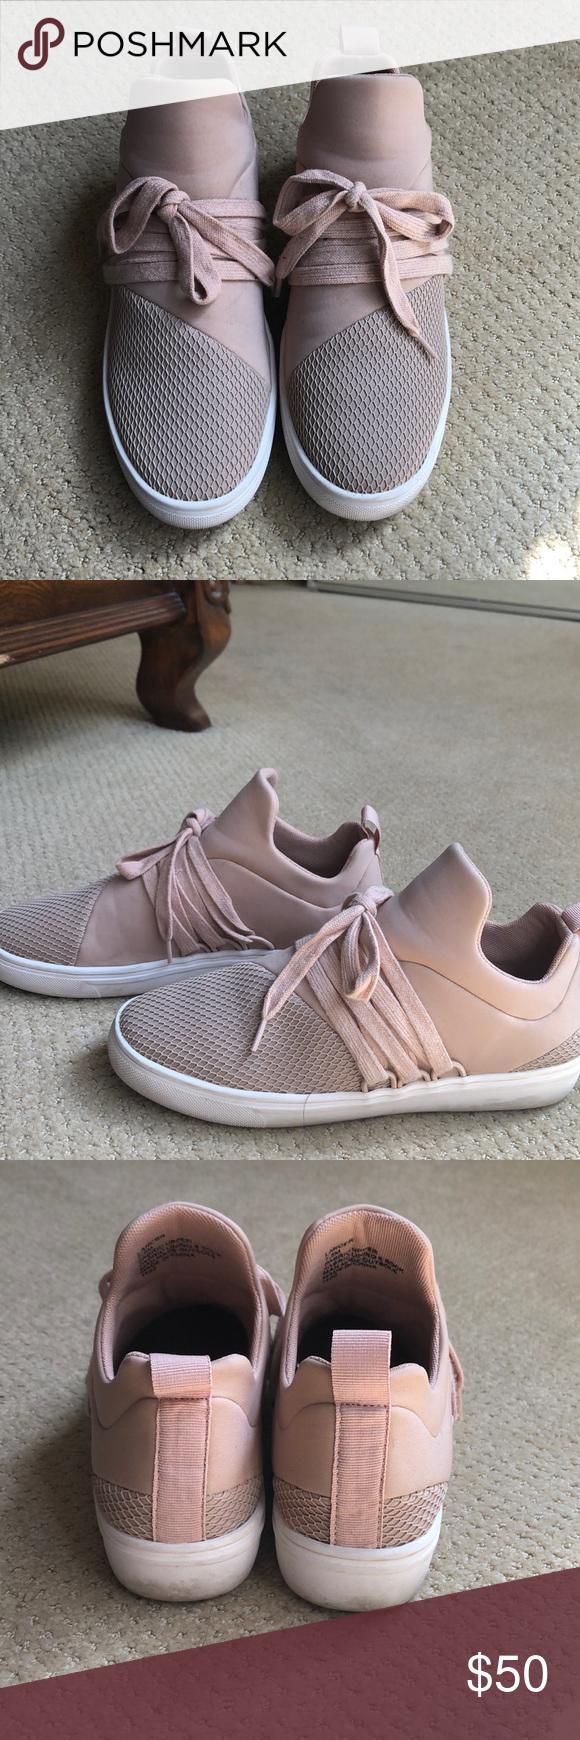 Steve Madden light pink sneakers size 7